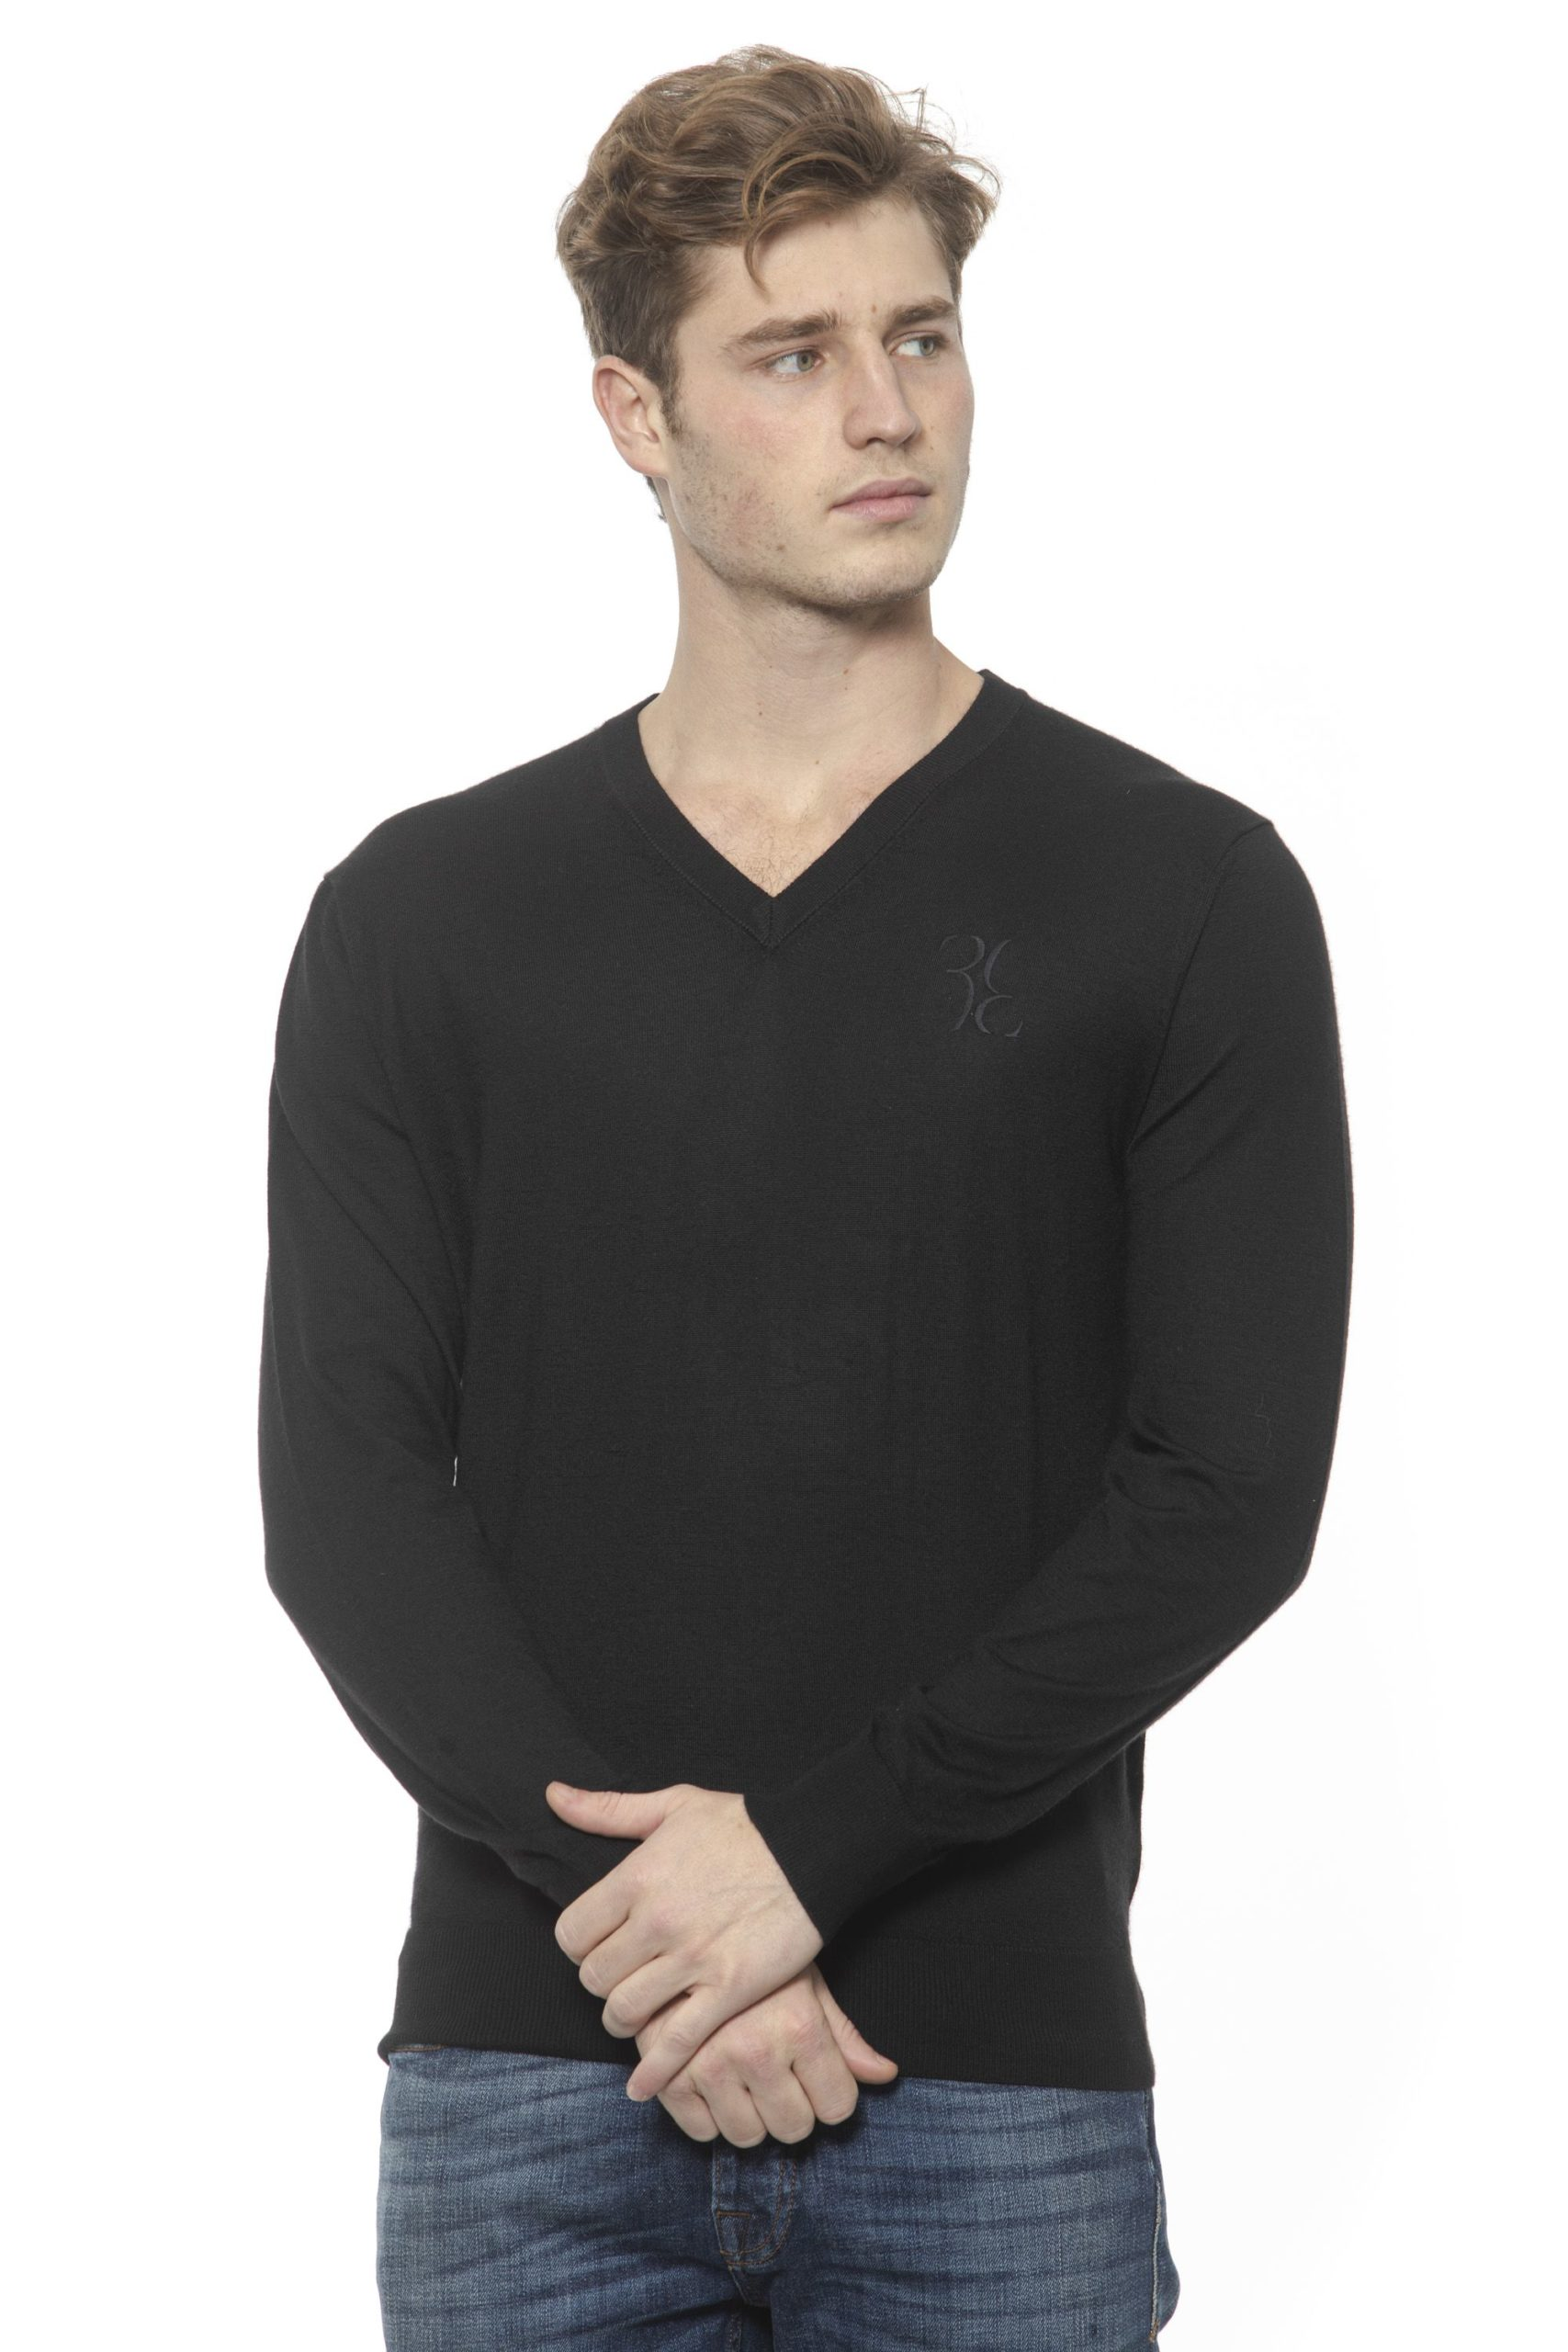 Billionaire Italian Couture Men's Nero Sweater Black BI1313532 - S